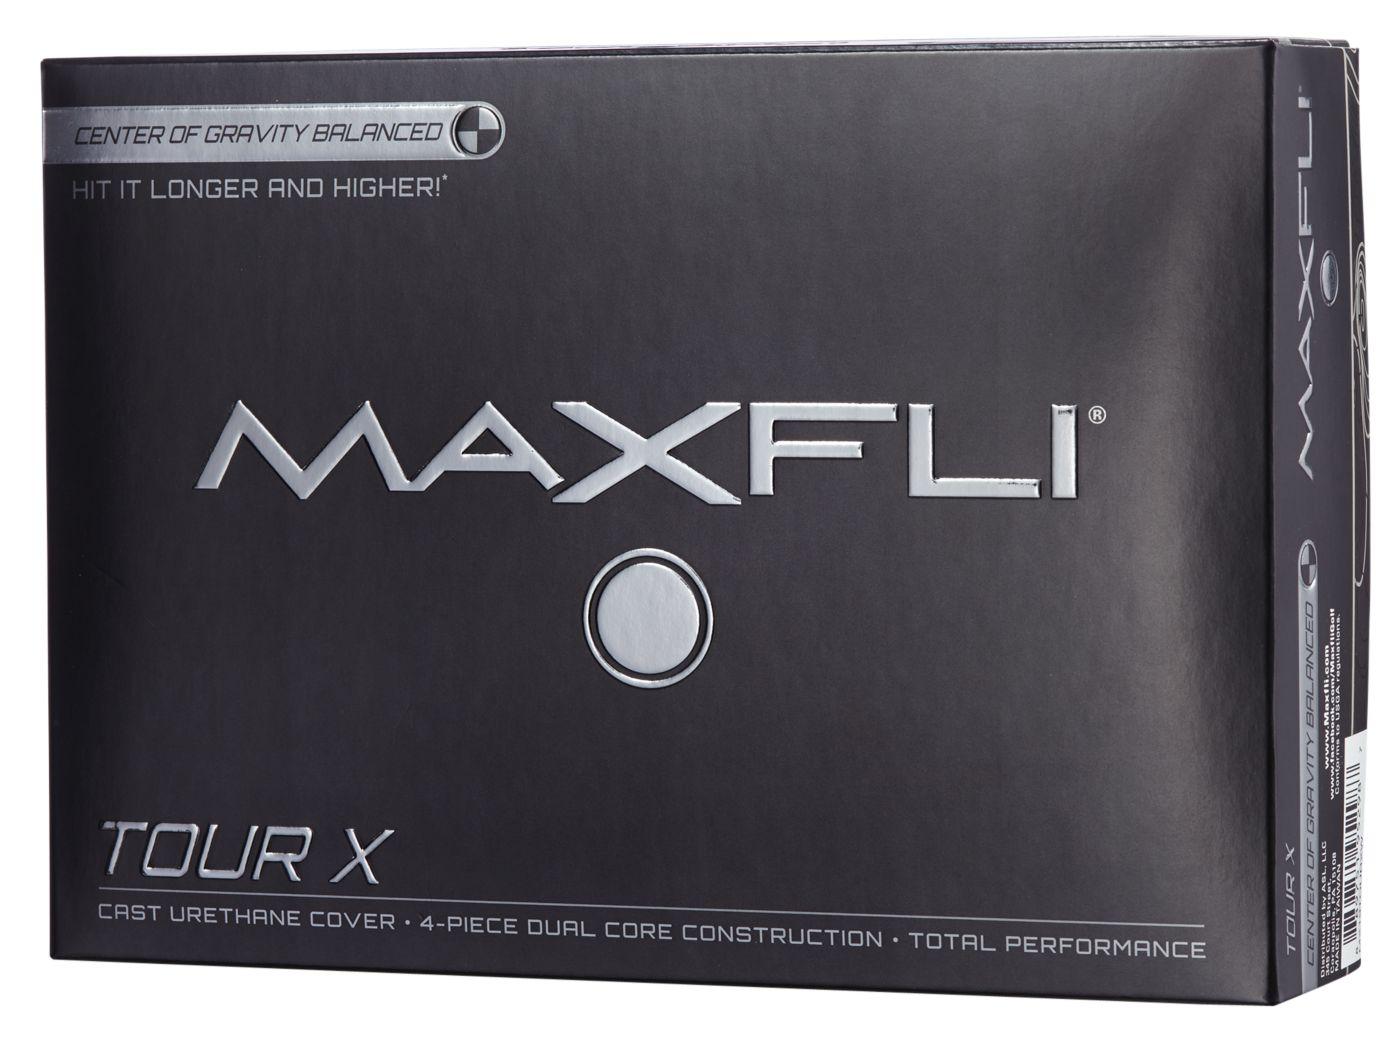 Maxfli 2019 Tour X Personalized Golf Balls